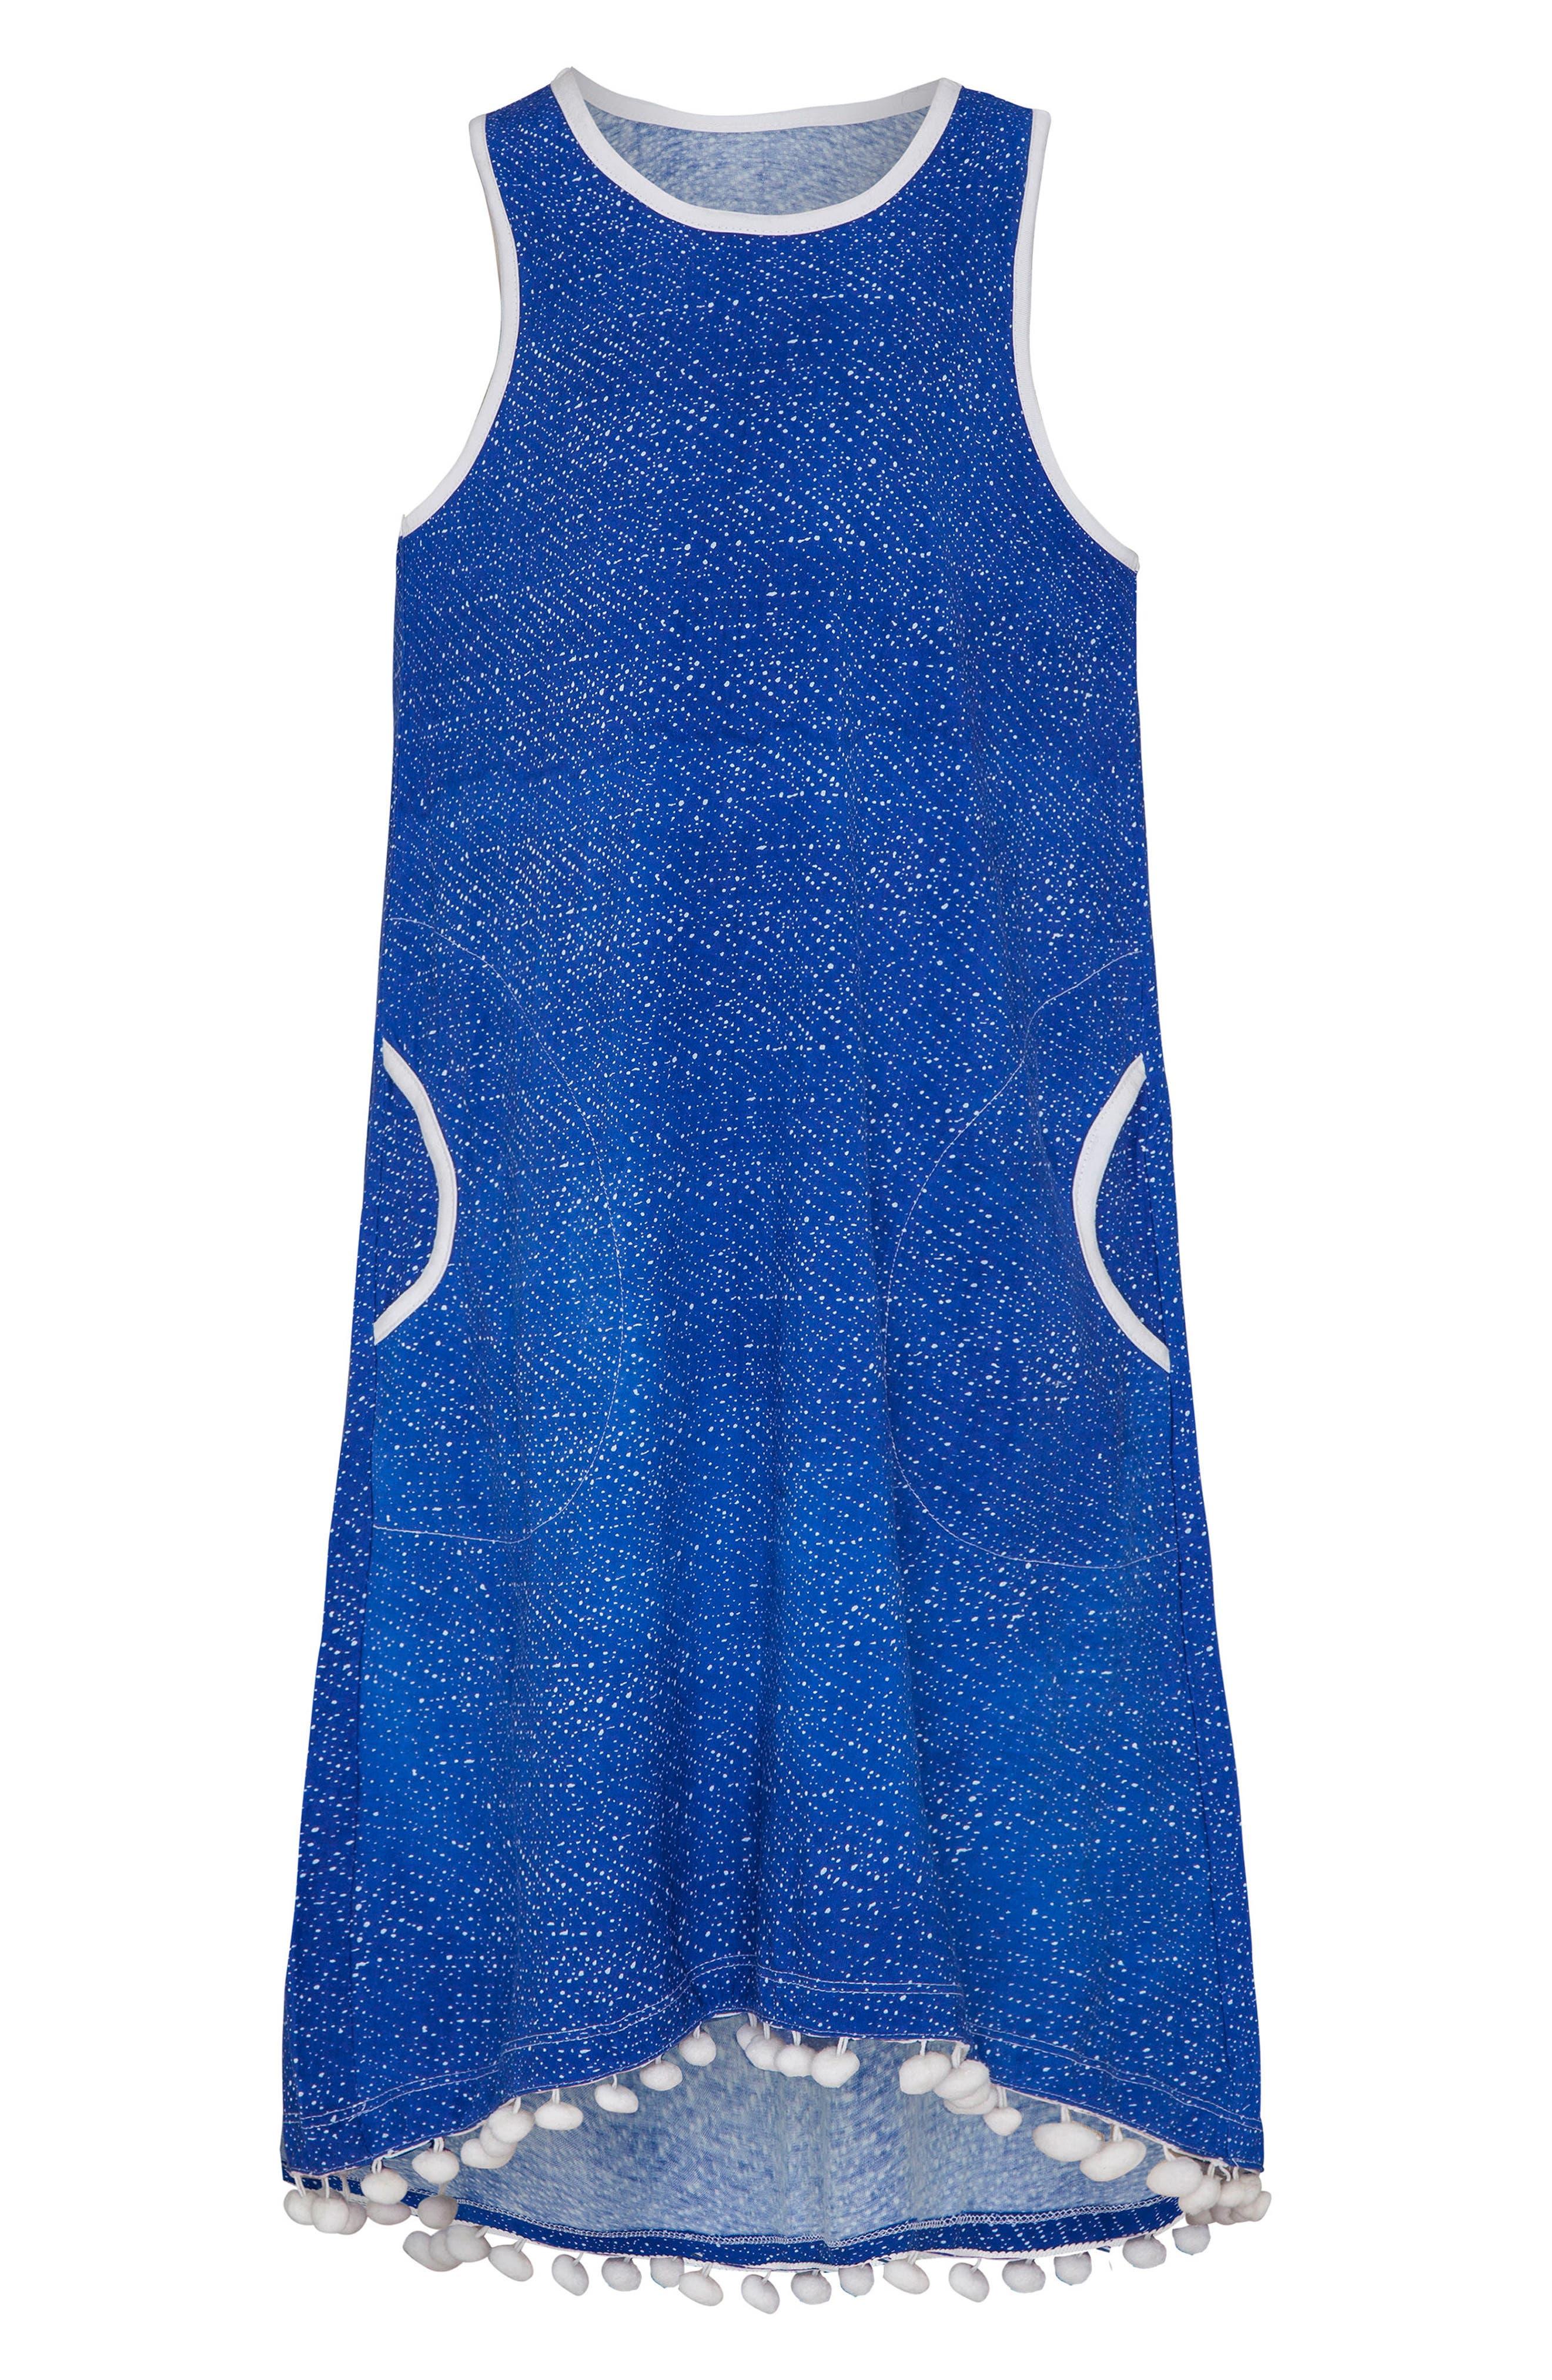 Alternate Image 1 Selected - Platypus Australia Print Cover-Up Dress (Big Girls)